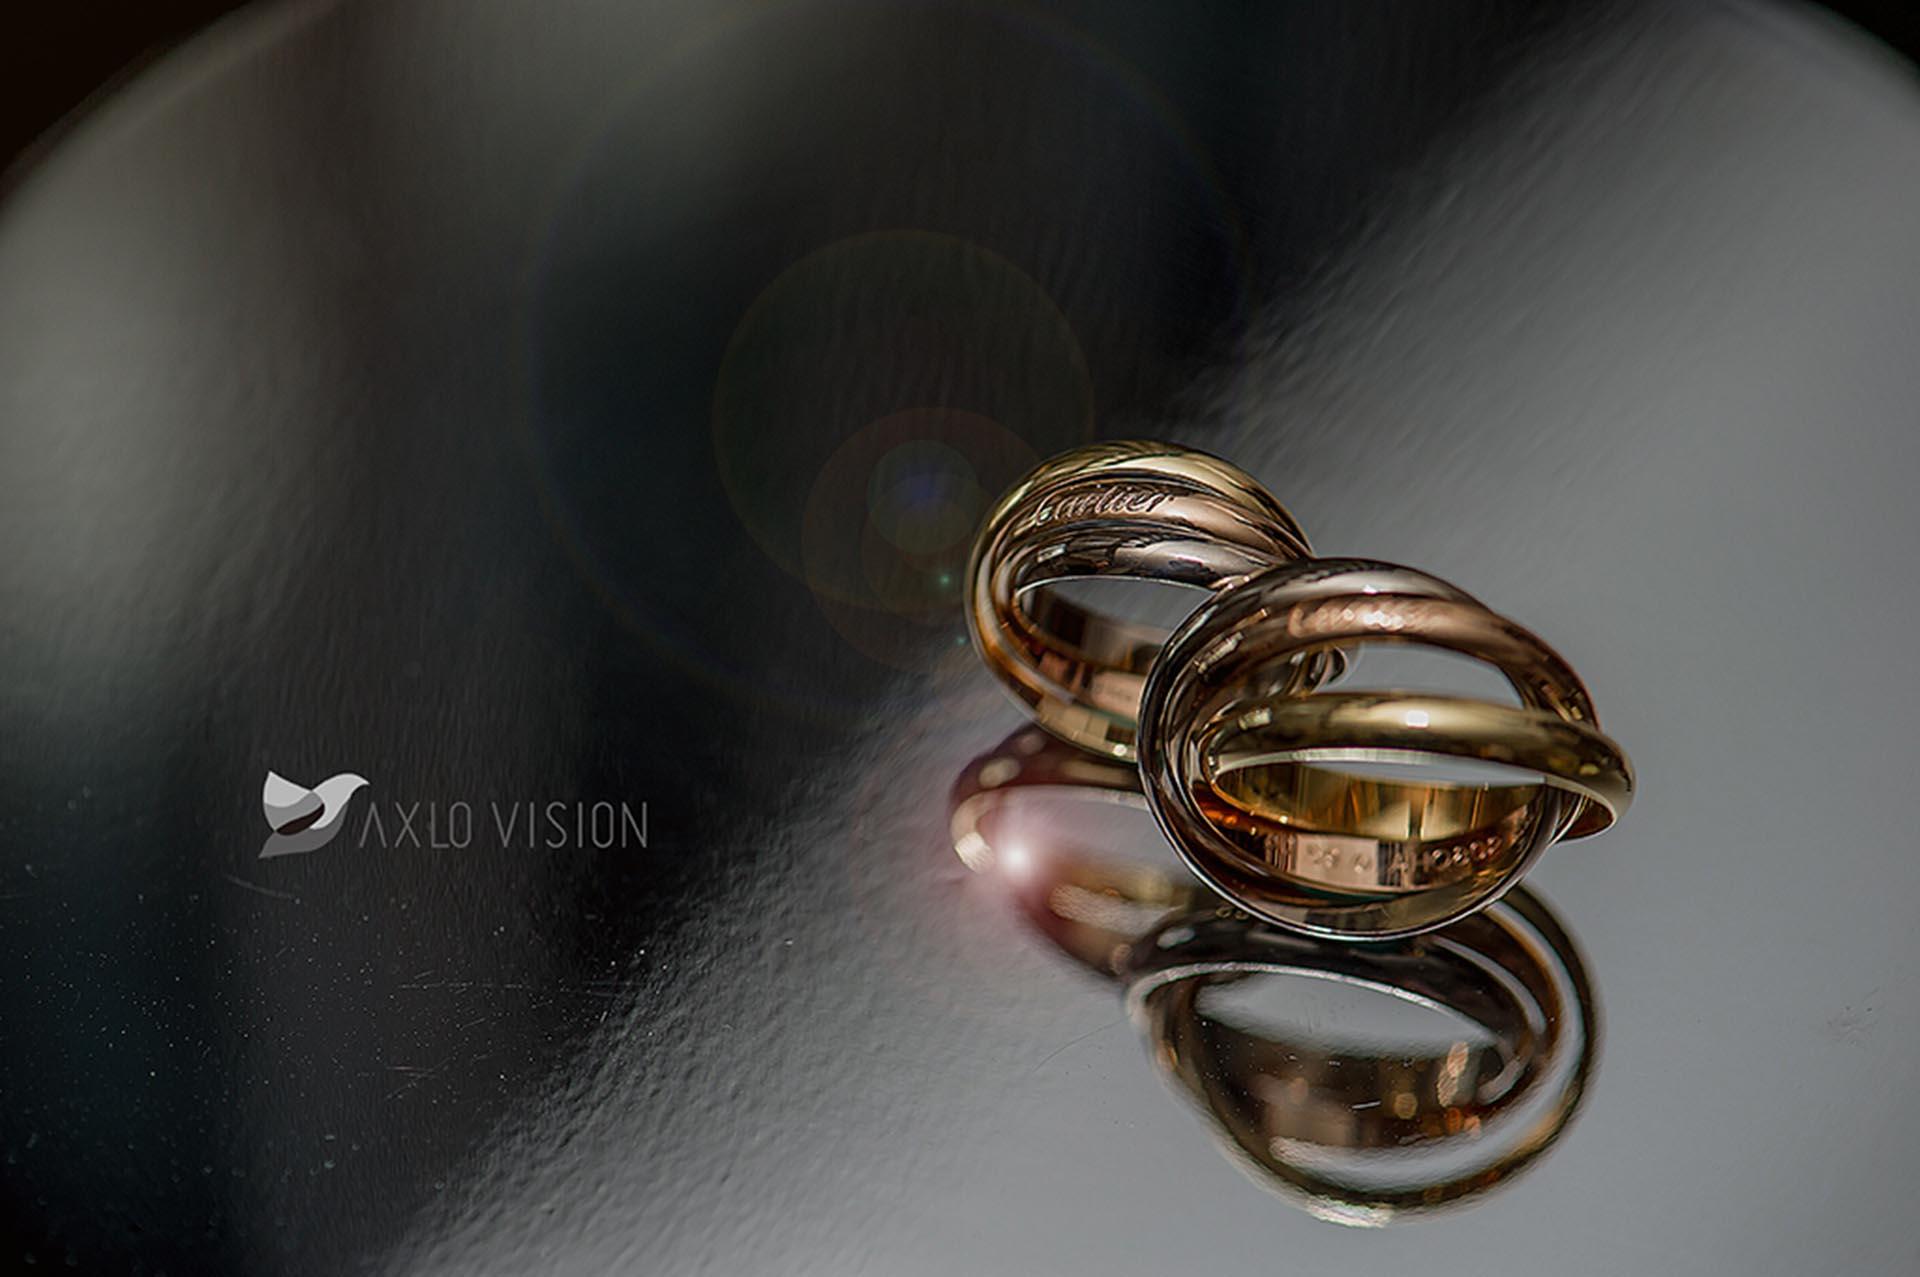 2017 AXLO web 首頁用 婚禮攝影_009